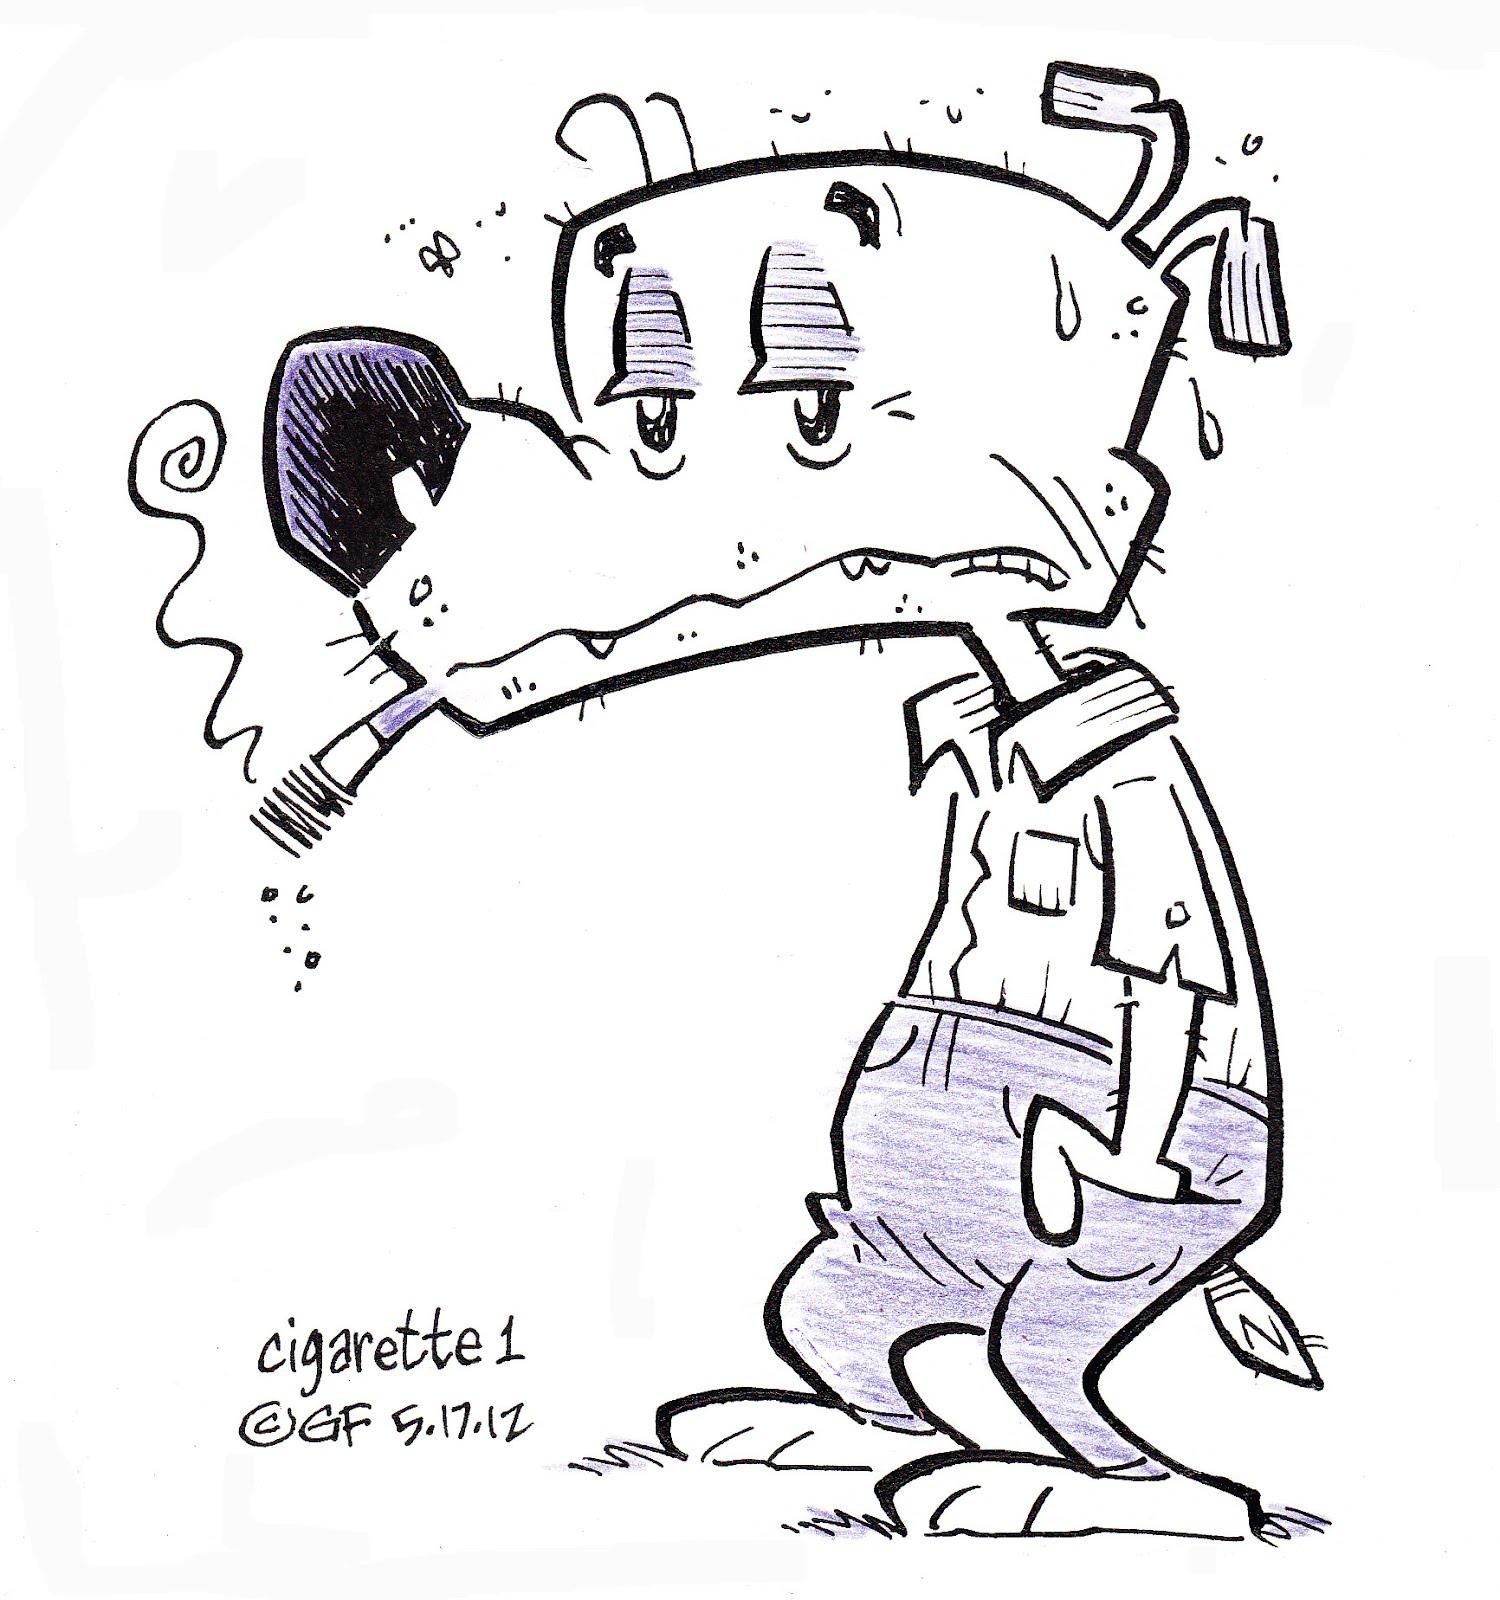 Gary Fields Studios Blog Cigarette 1